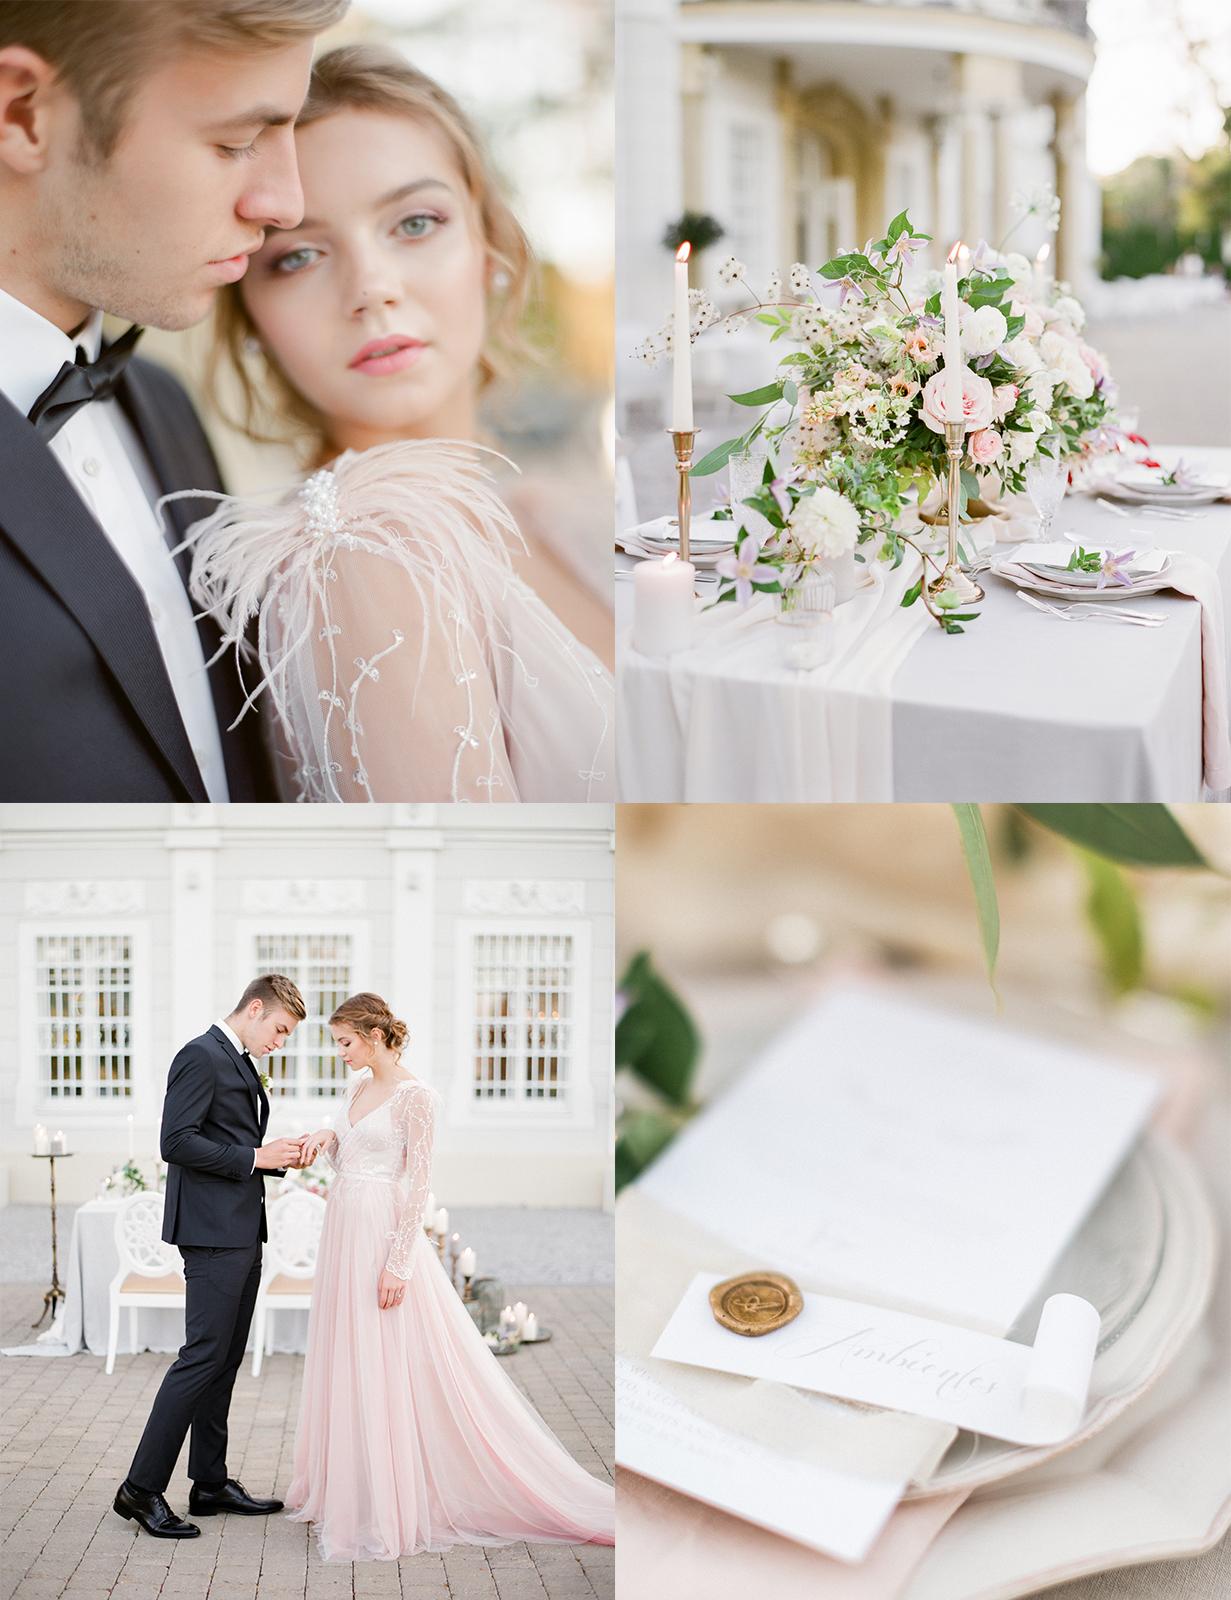 kastiel tomasov svadba hotelkastiel svadobny fotograf film wedding photographer lago di como tuscany